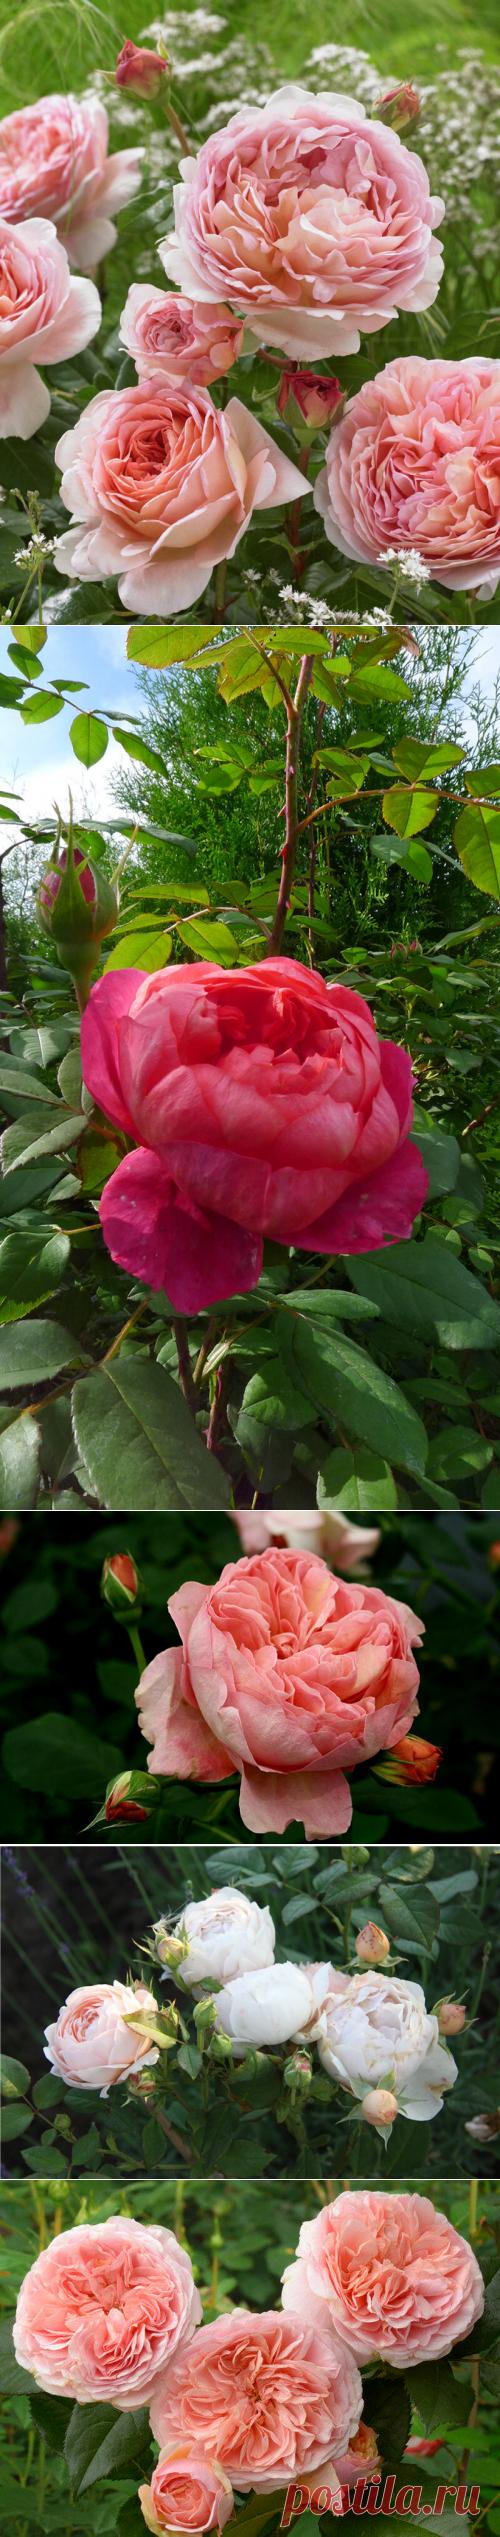 Зимостойкие сорта роз Дэвида Остина | Флористика наизнанку | Яндекс Дзен